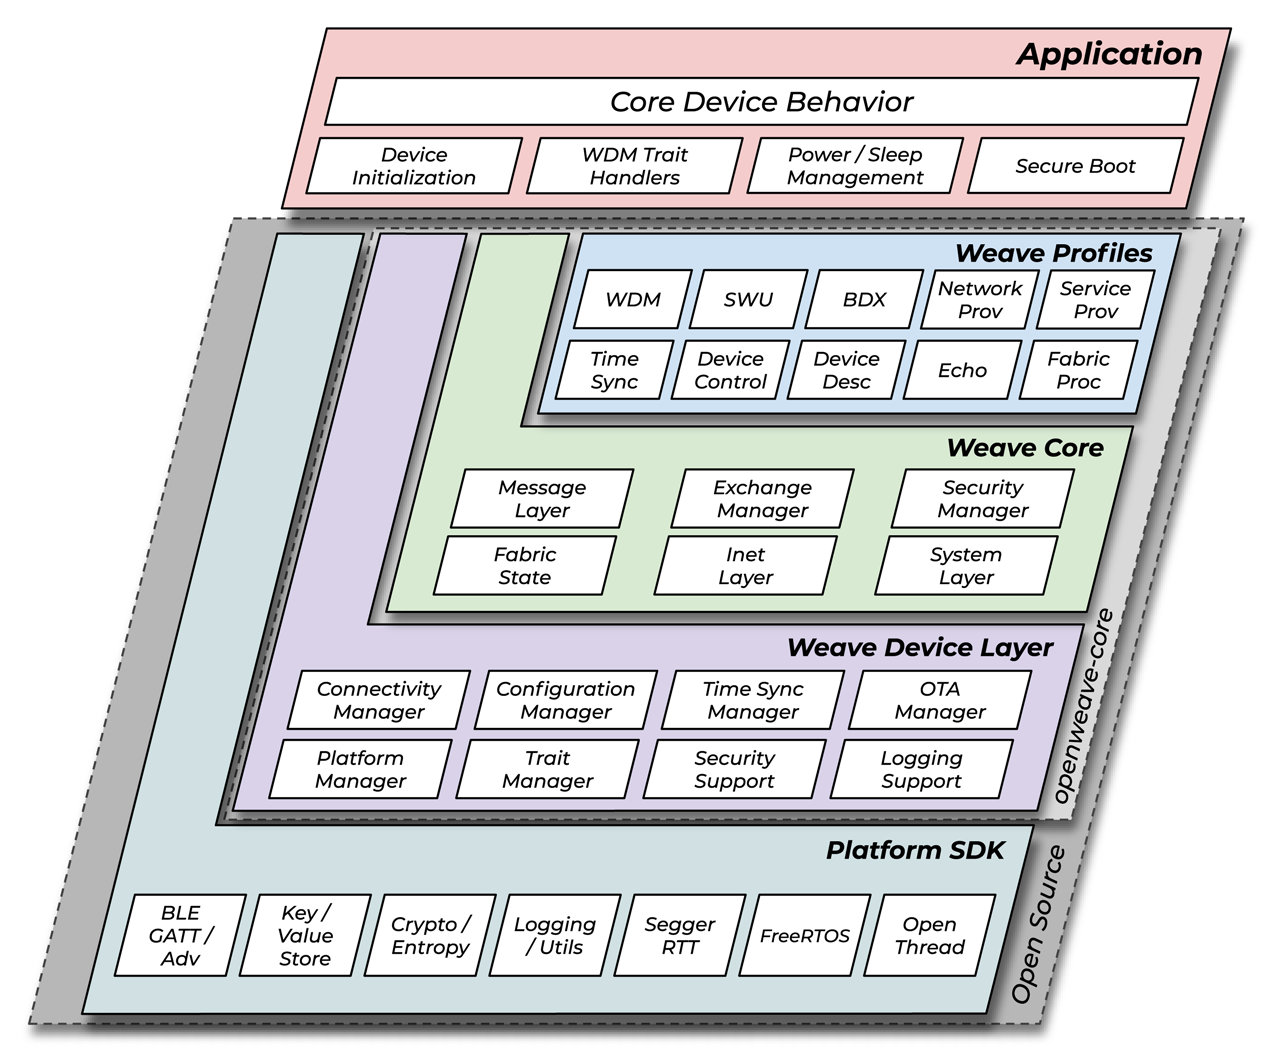 Arquitectura de capa de dispositivo OpenWeave